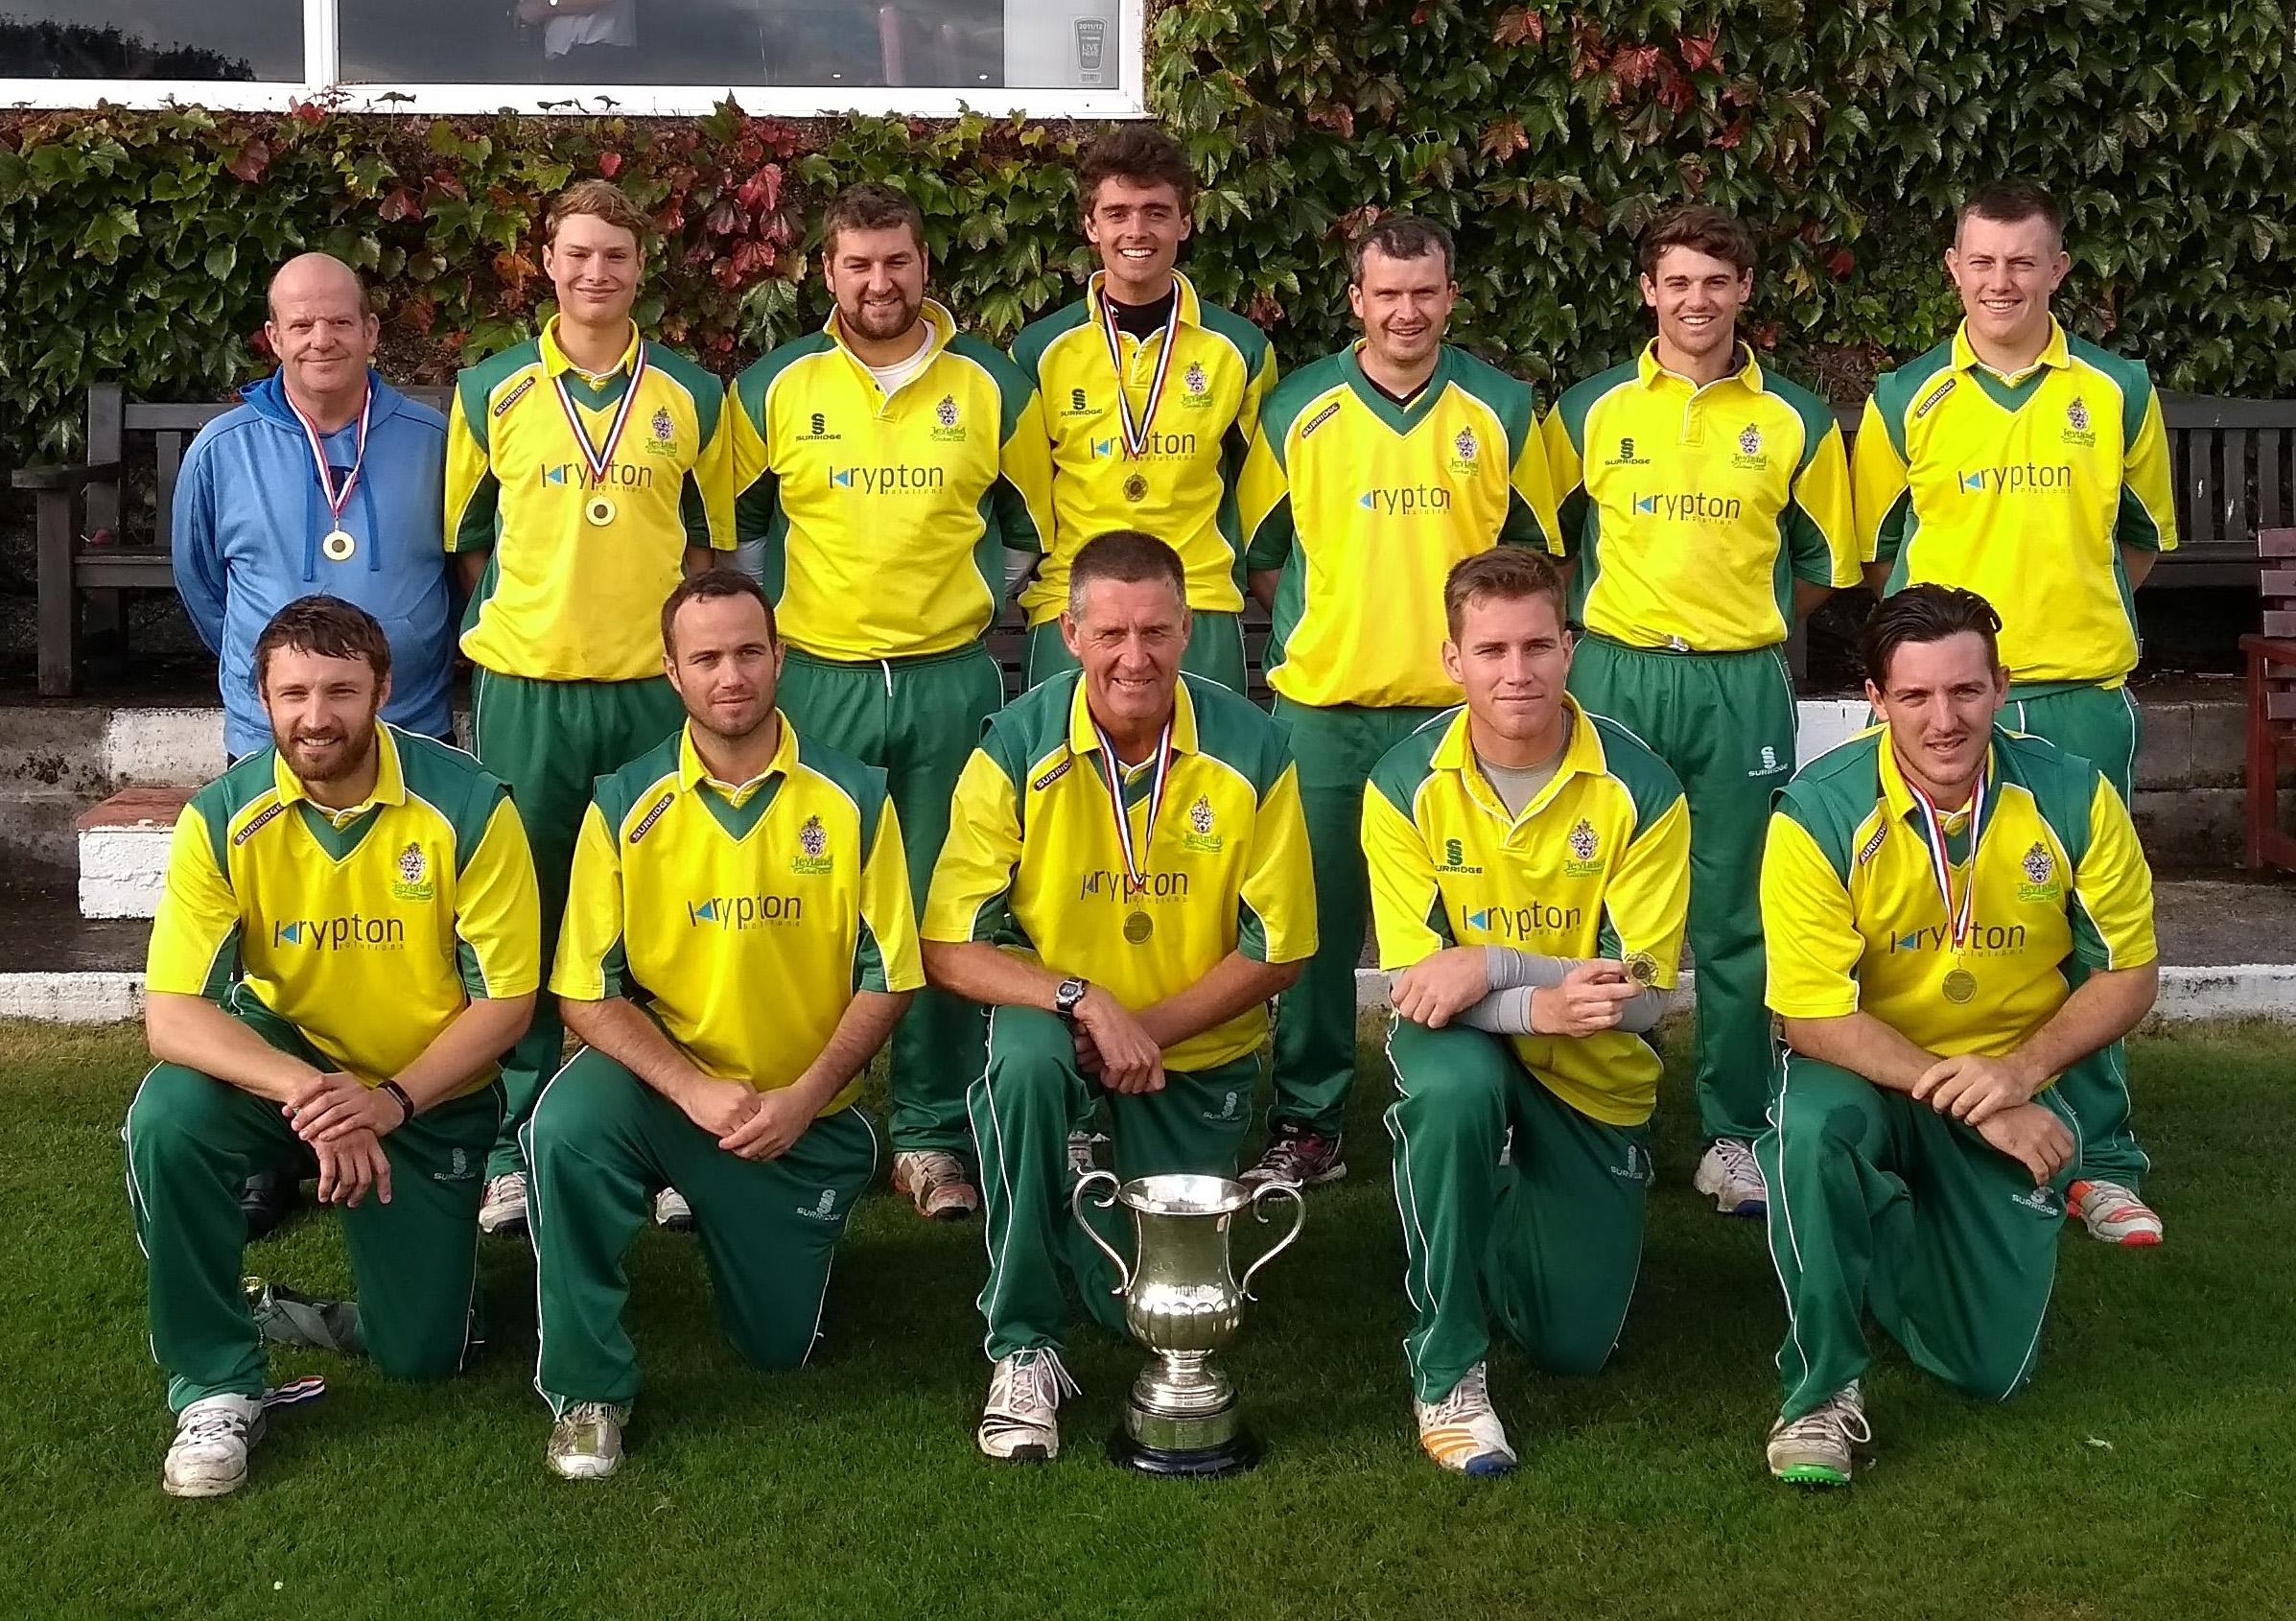 Leyland_1st_Team_Cup_Winners